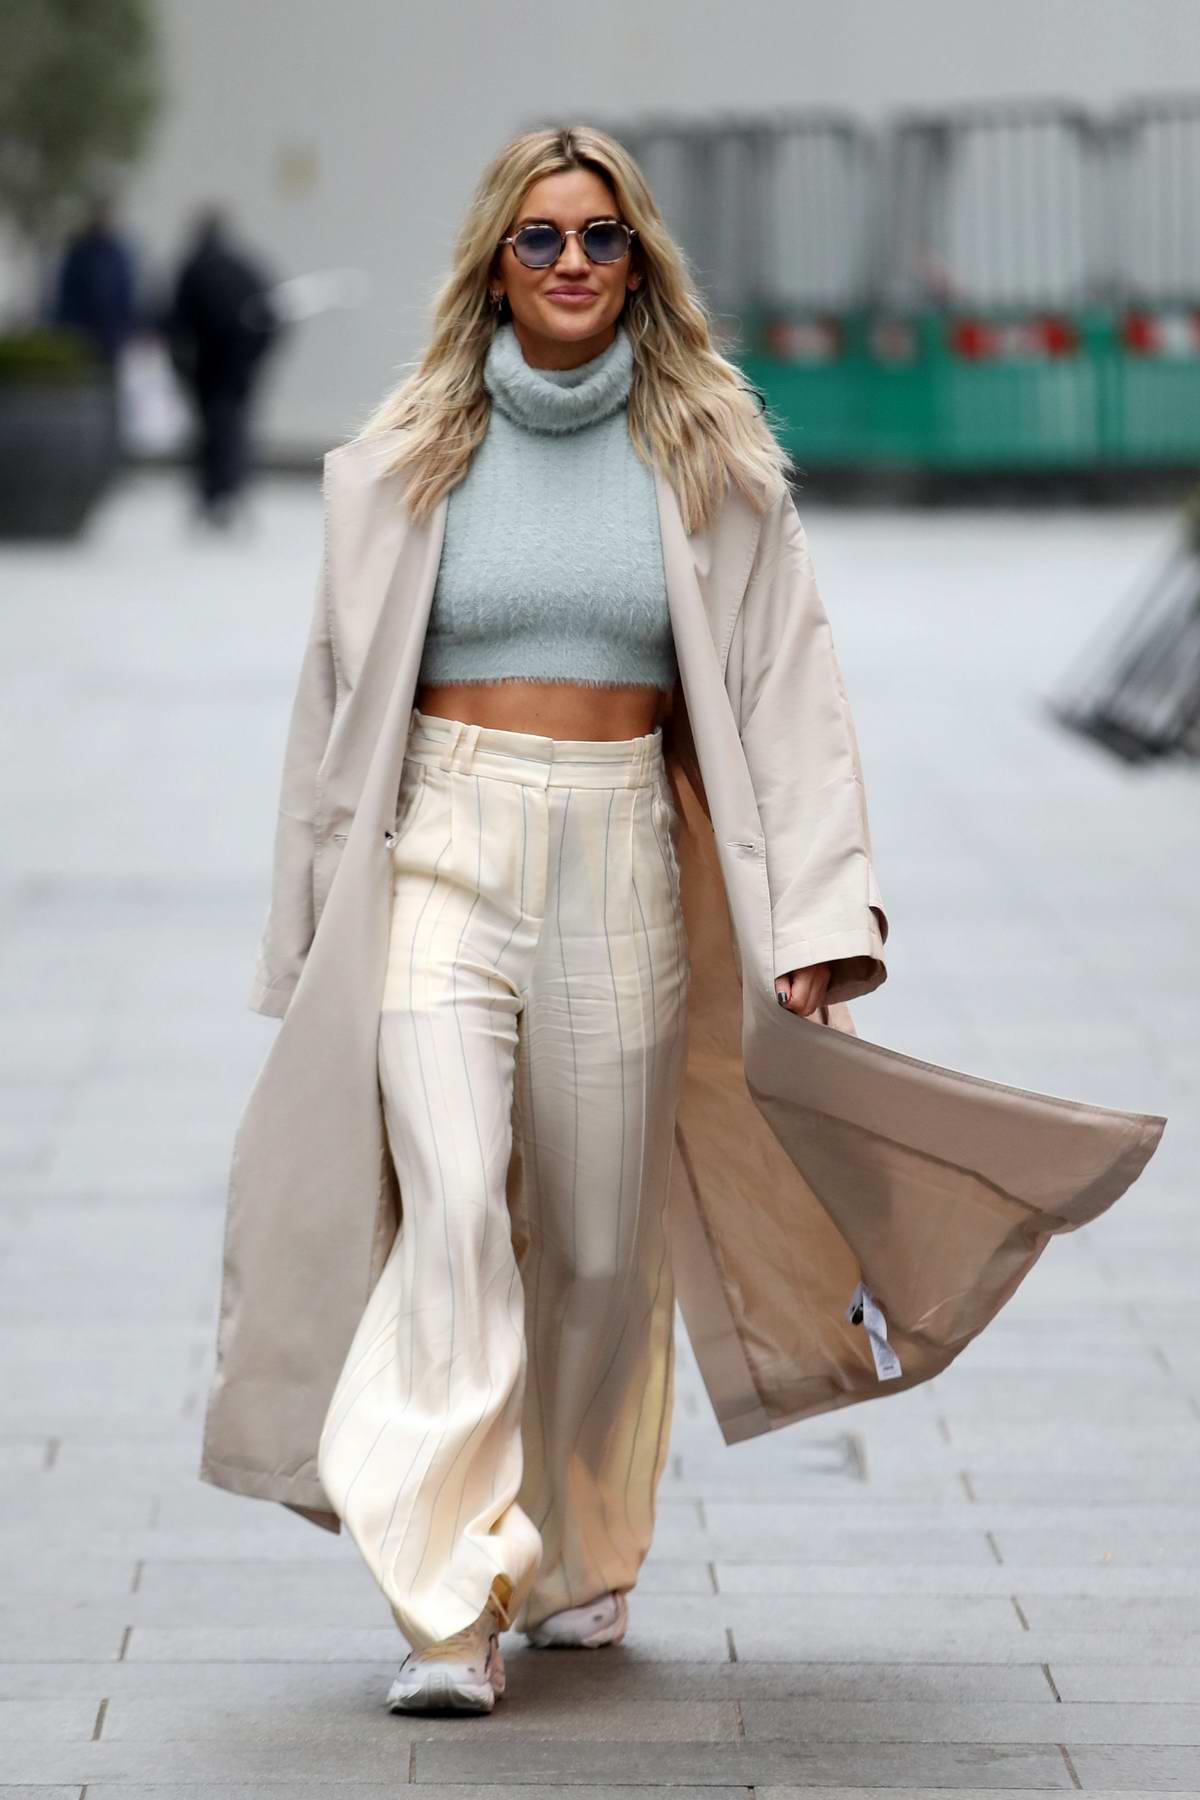 Ashley Roberts looks stylish as she leaves Global Radio Studios in London, UK